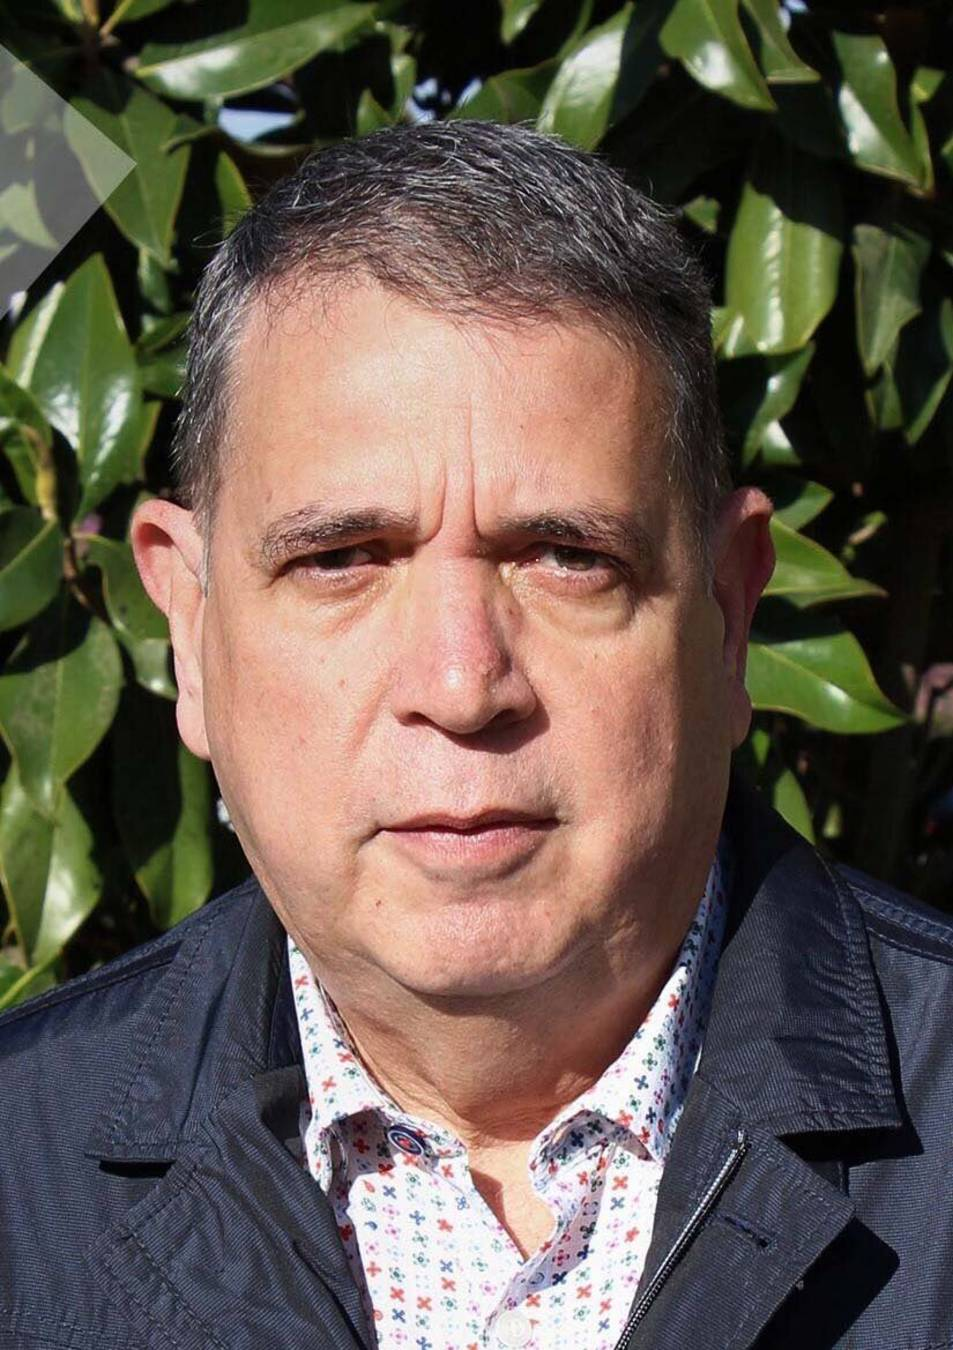 Carles Prats Alonso